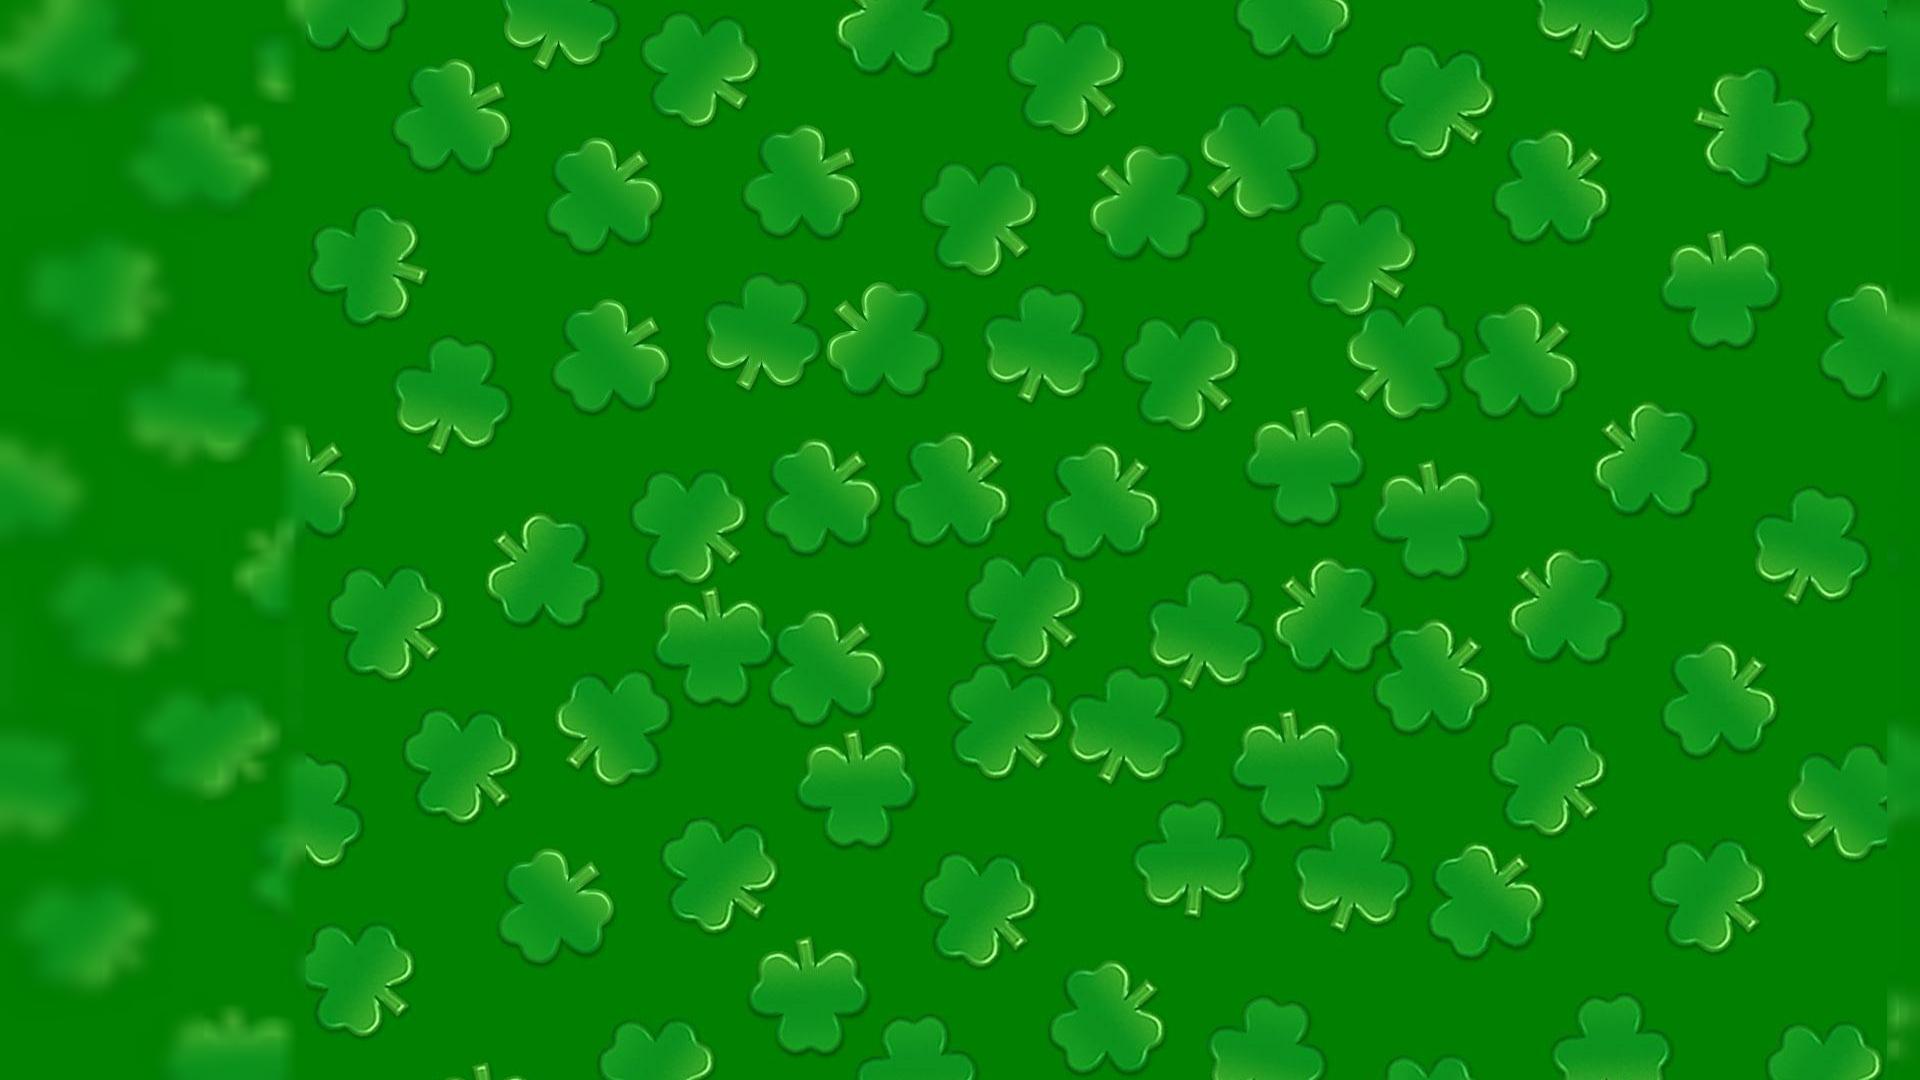 St Patricks Day HD Wallpaper Wide Screen Wallpaper 1920x1080